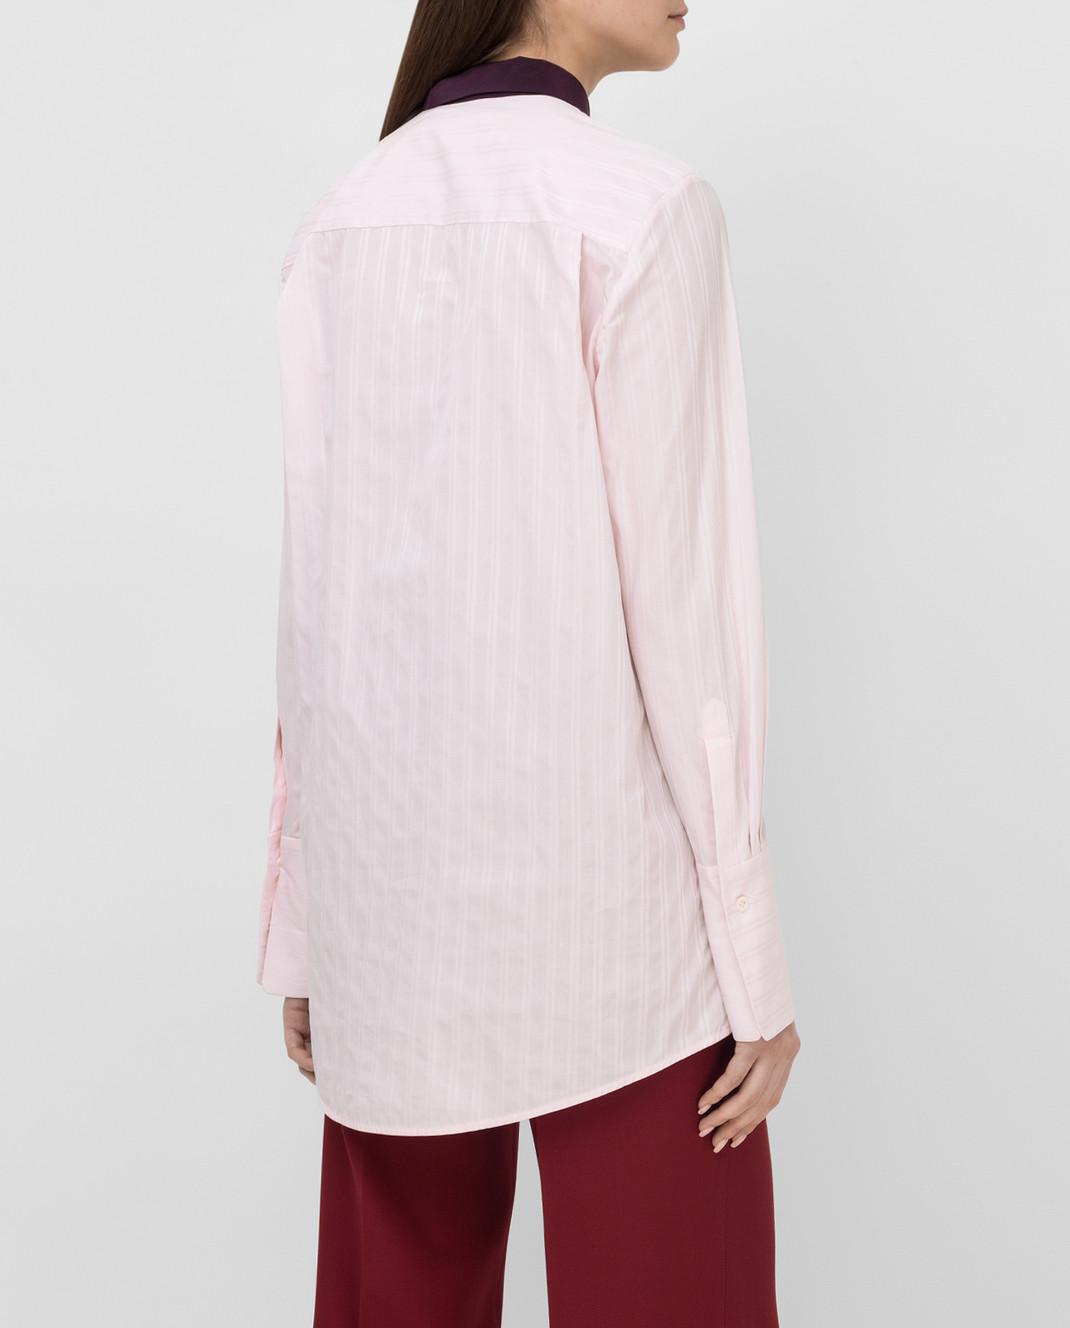 Victoria by Victoria Beckham Розовая рубашка SHVV117 изображение 4